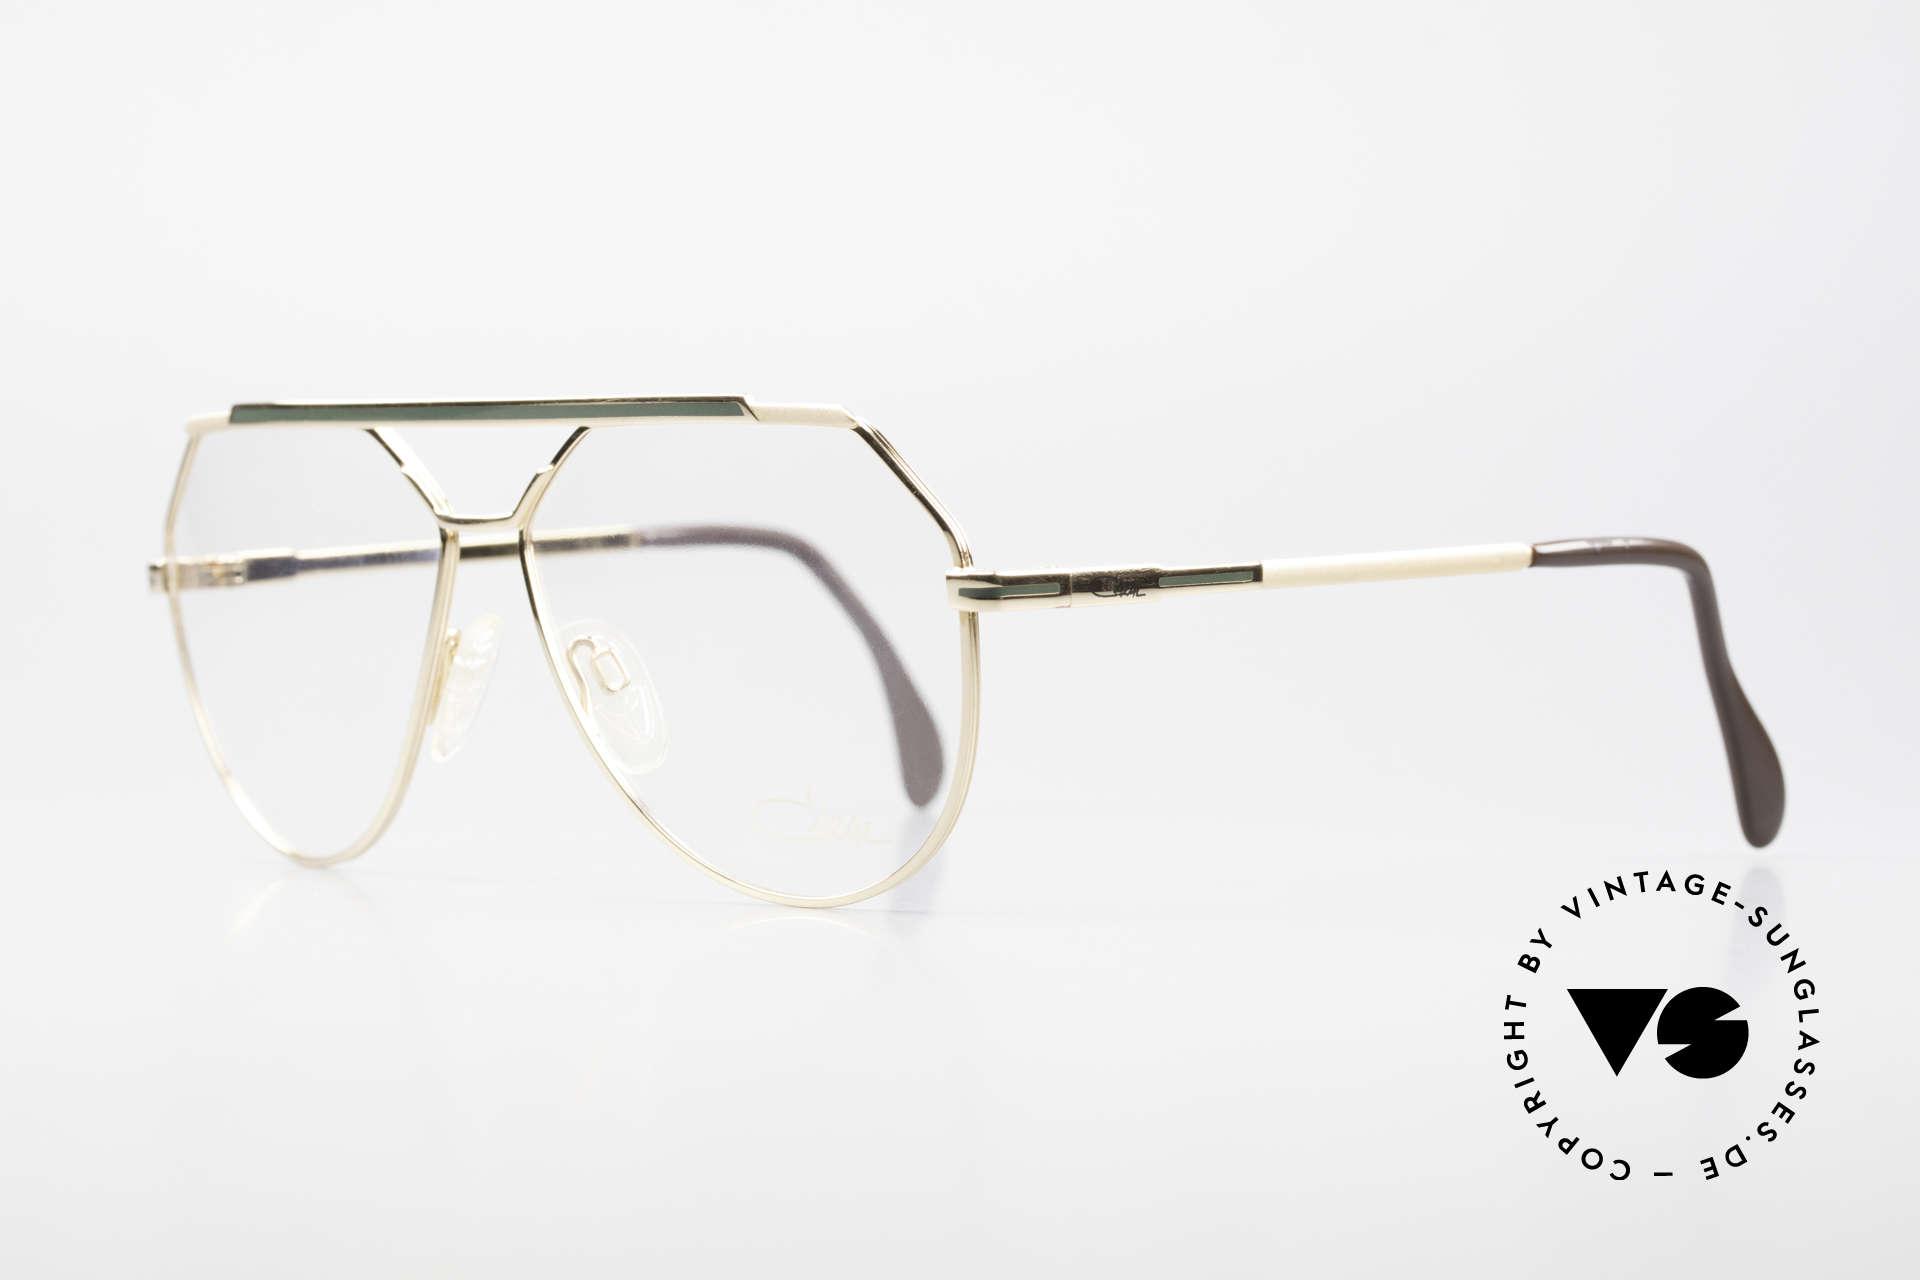 Cazal 733 Old Cazal Aviator Eyeglasses, finest craftsmanship (gold-plated); large size 60-13, Made for Men